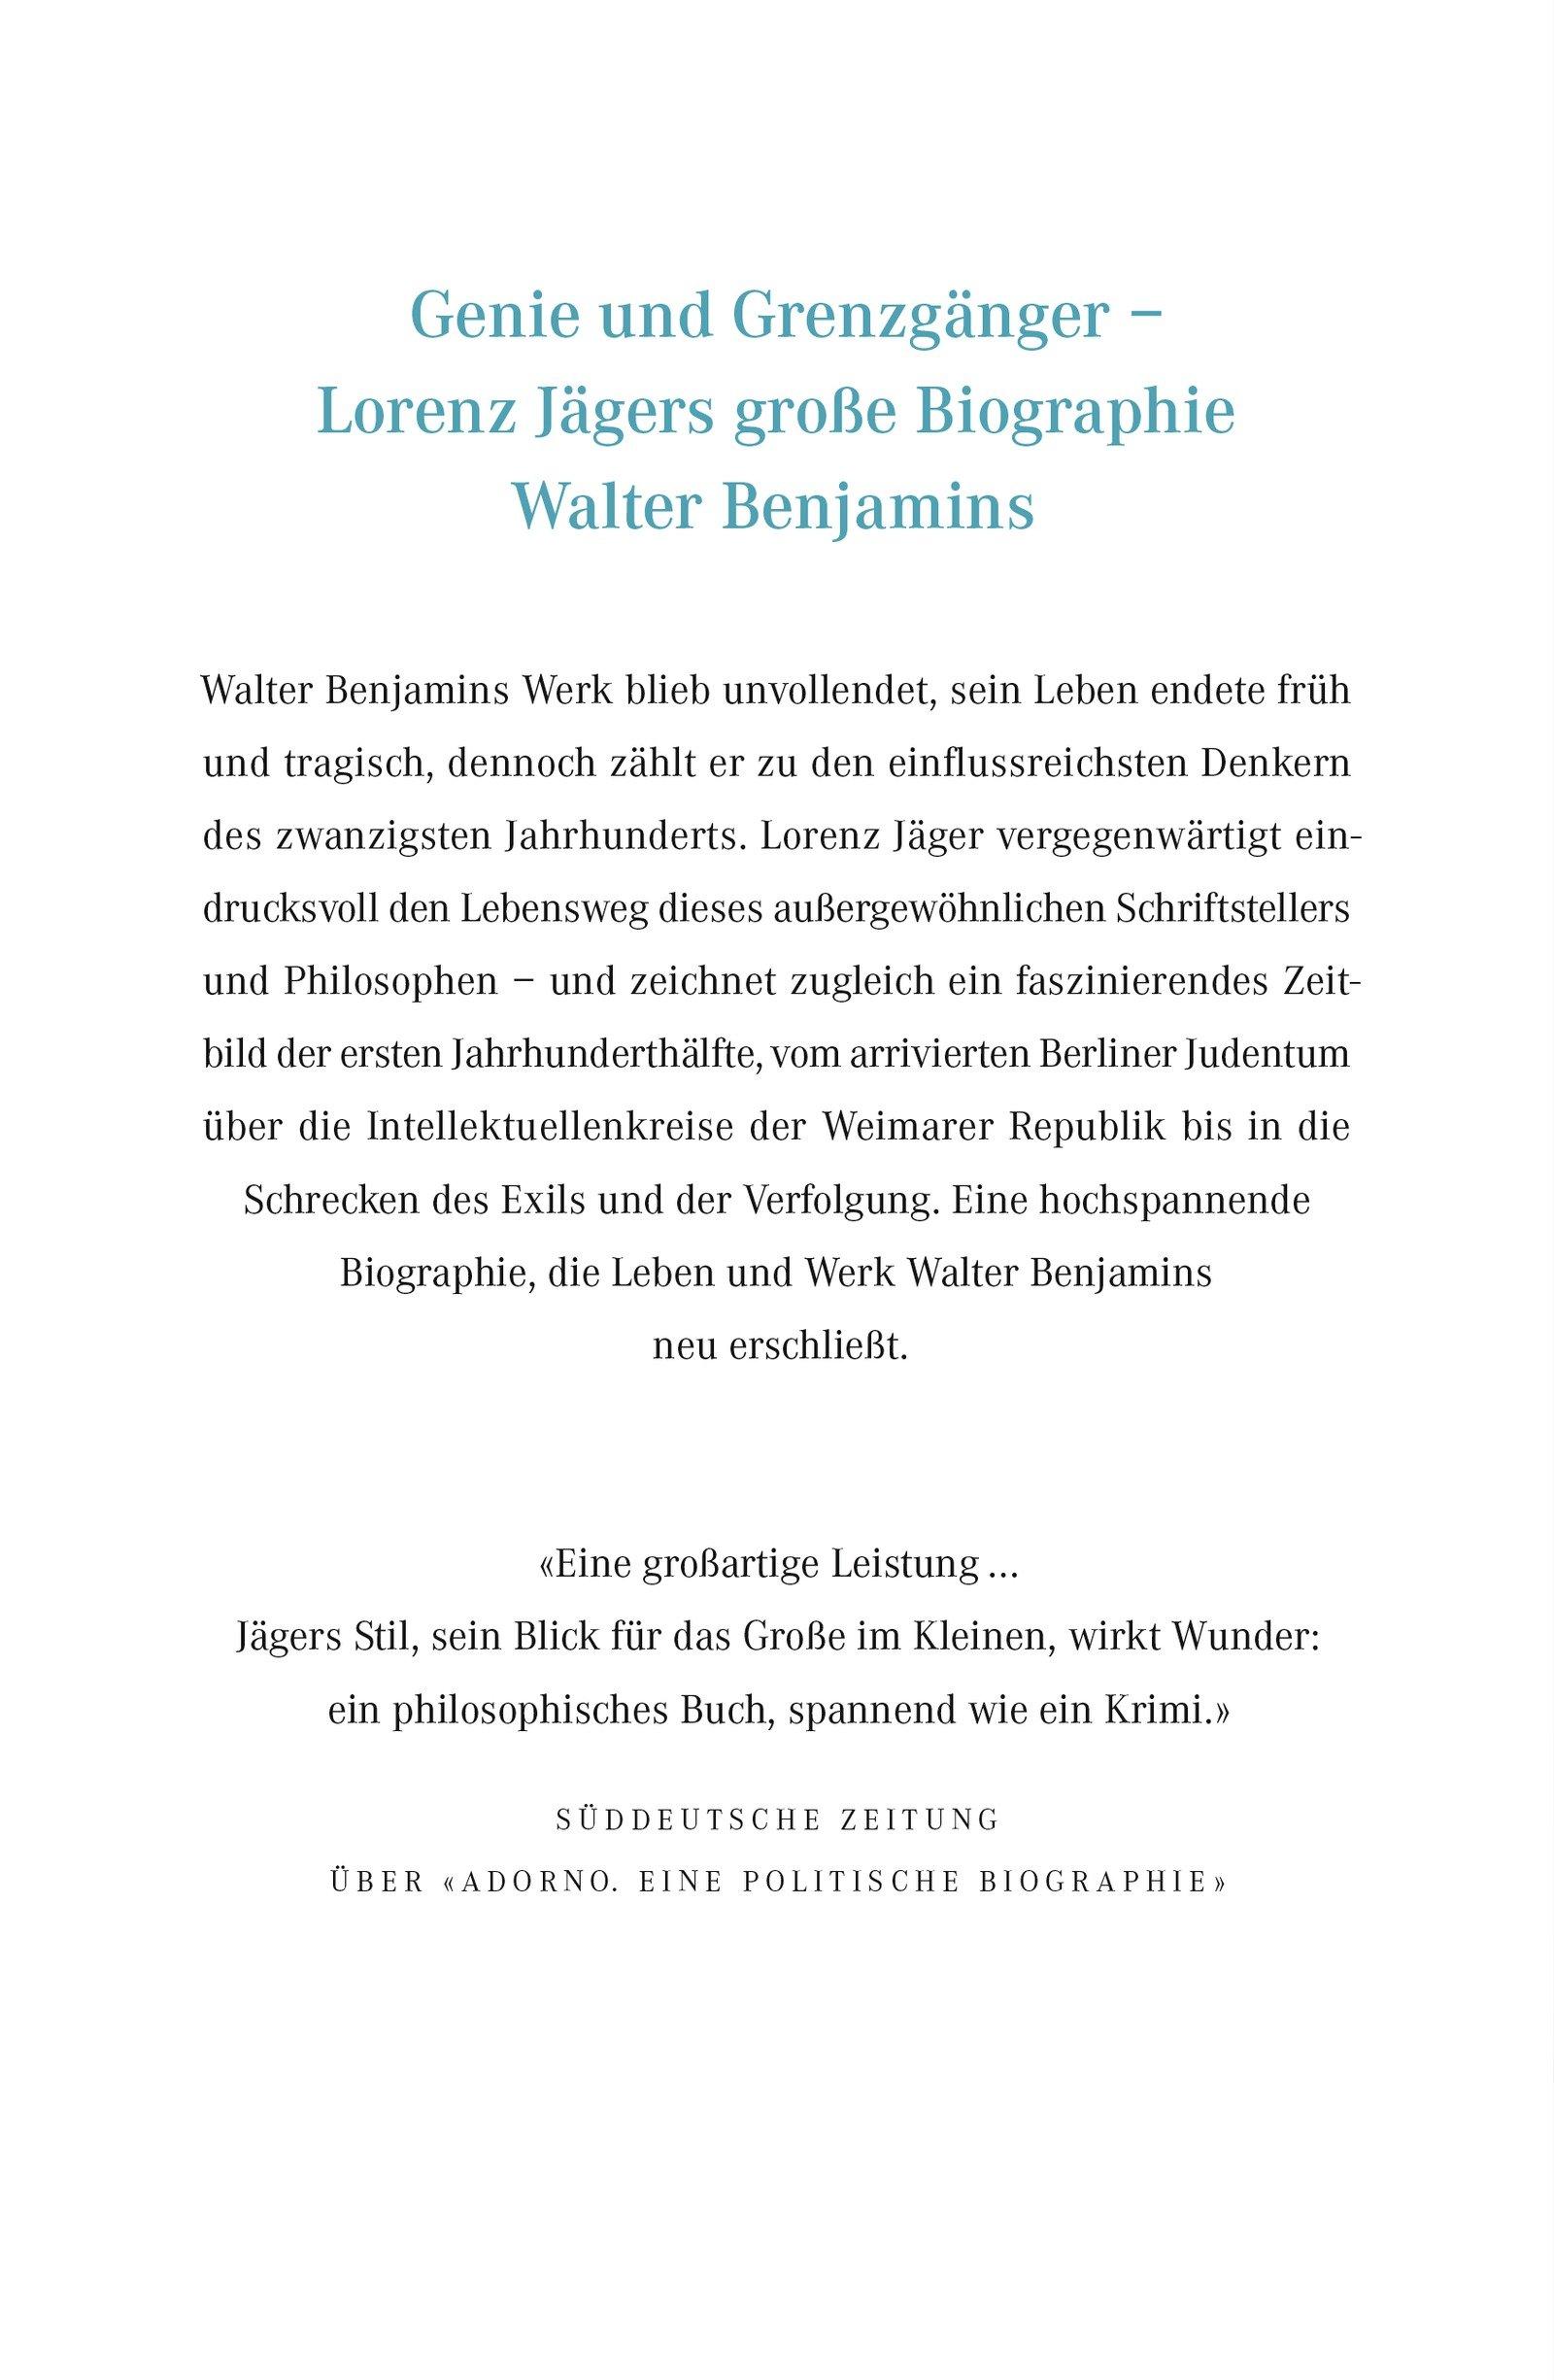 Atemberaubend Walter Benjamin: Das Leben eines Unvollendeten: Amazon.de: Lorenz @KY_63